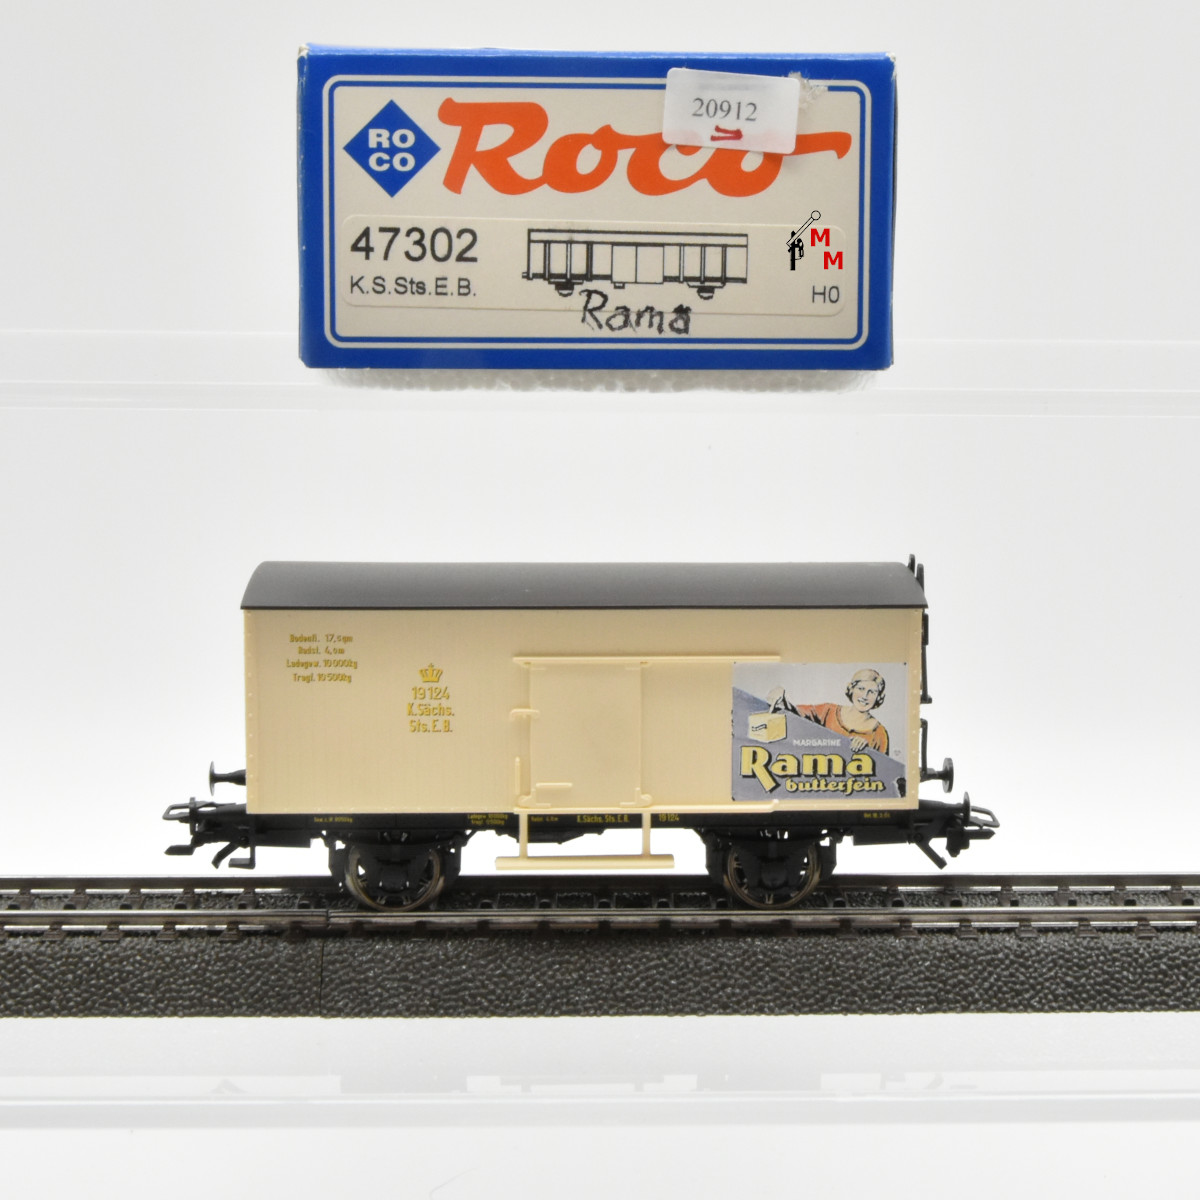 "Roco 47302 Flachdachwagen ""Rama"", (20912)"